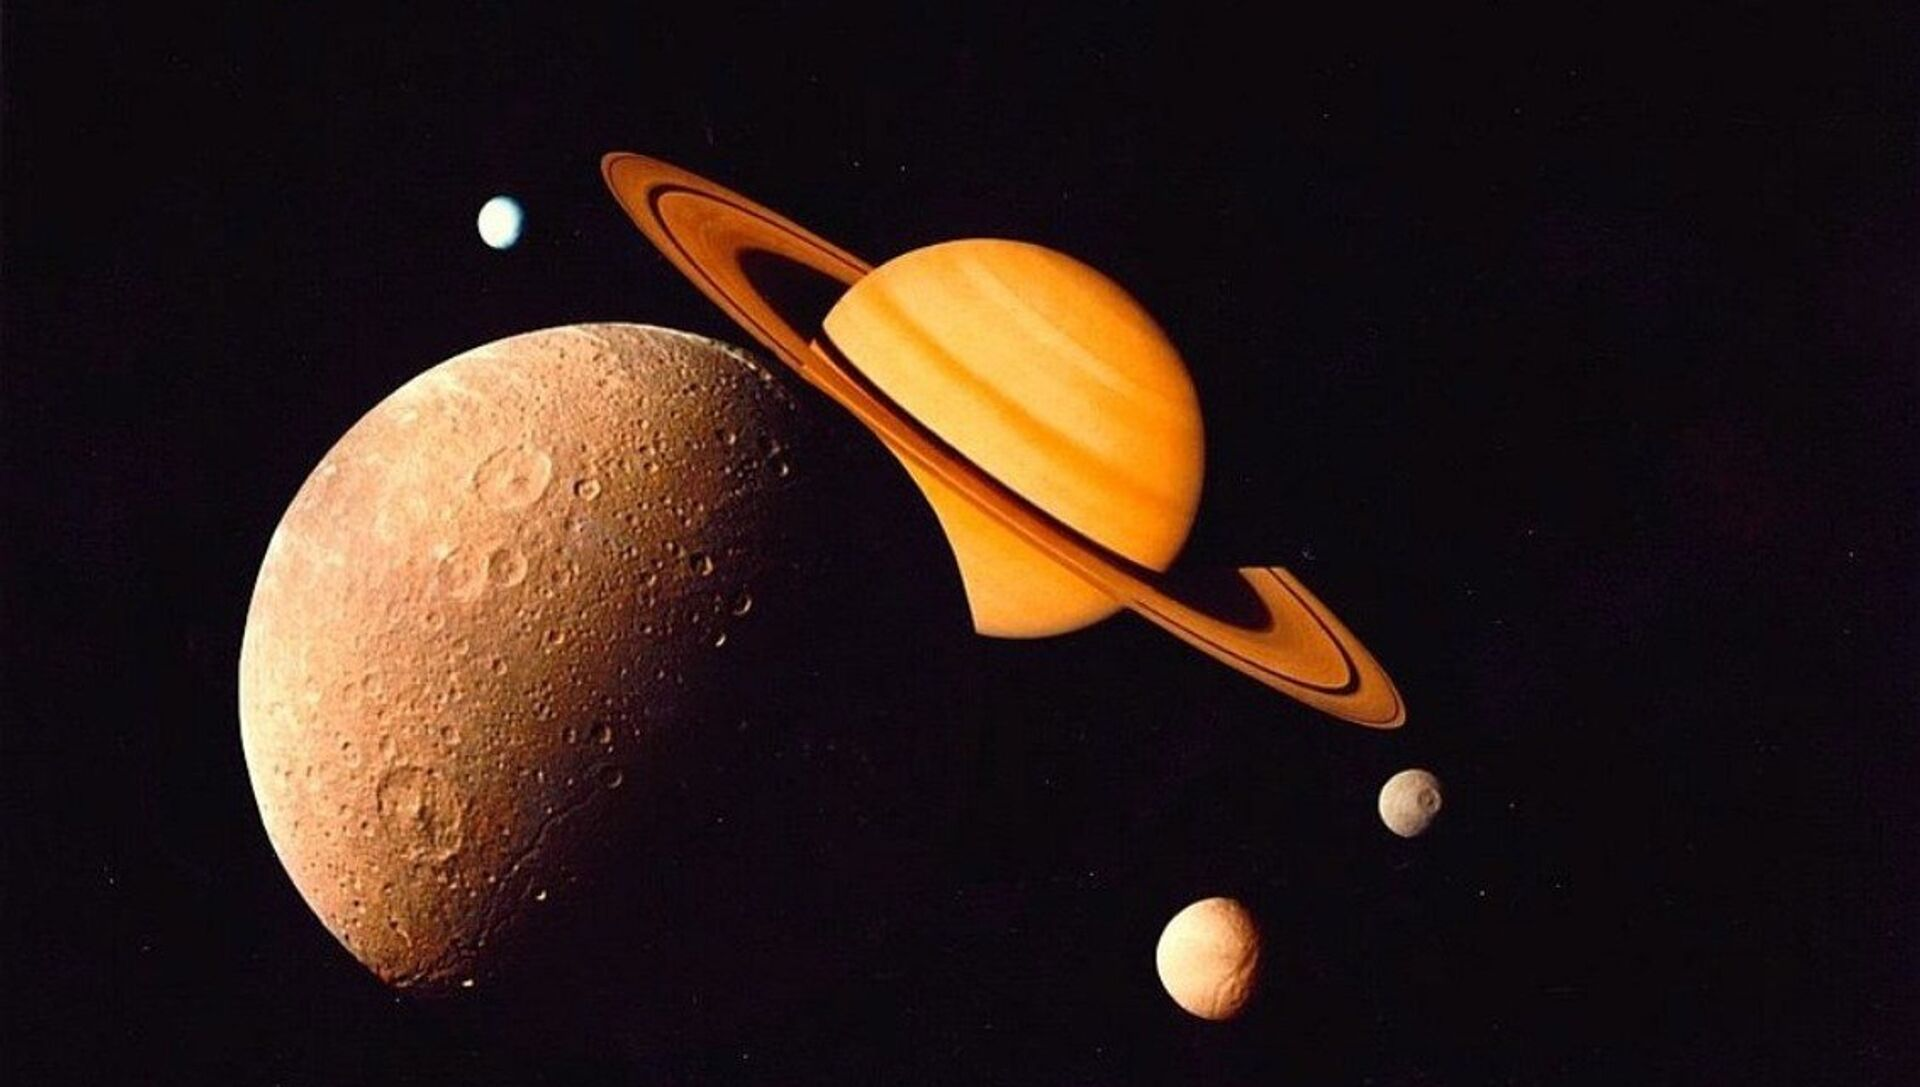 Titan, the largest Moon of Saturn - Sputnik Mundo, 1920, 28.10.2020